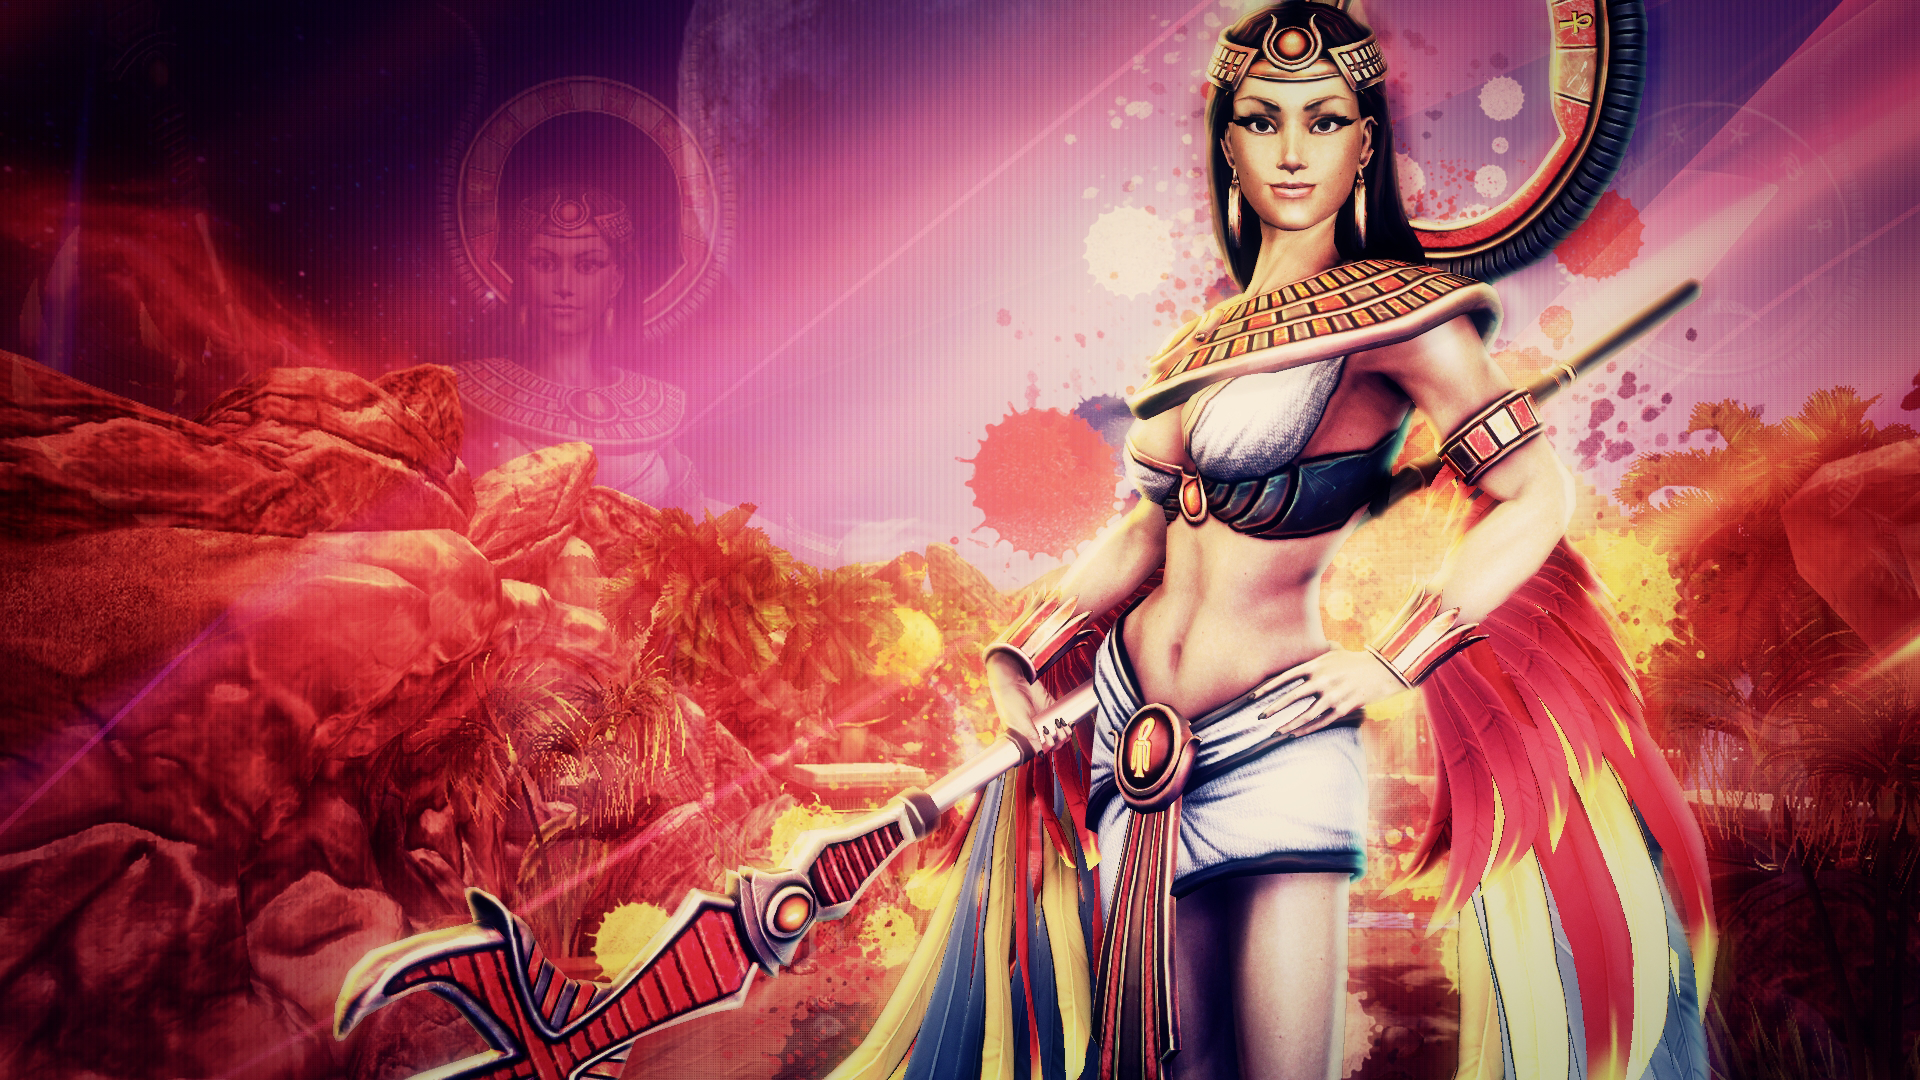 isis, goddess of magic - smite - wallpaper hdgetsukeii on deviantart